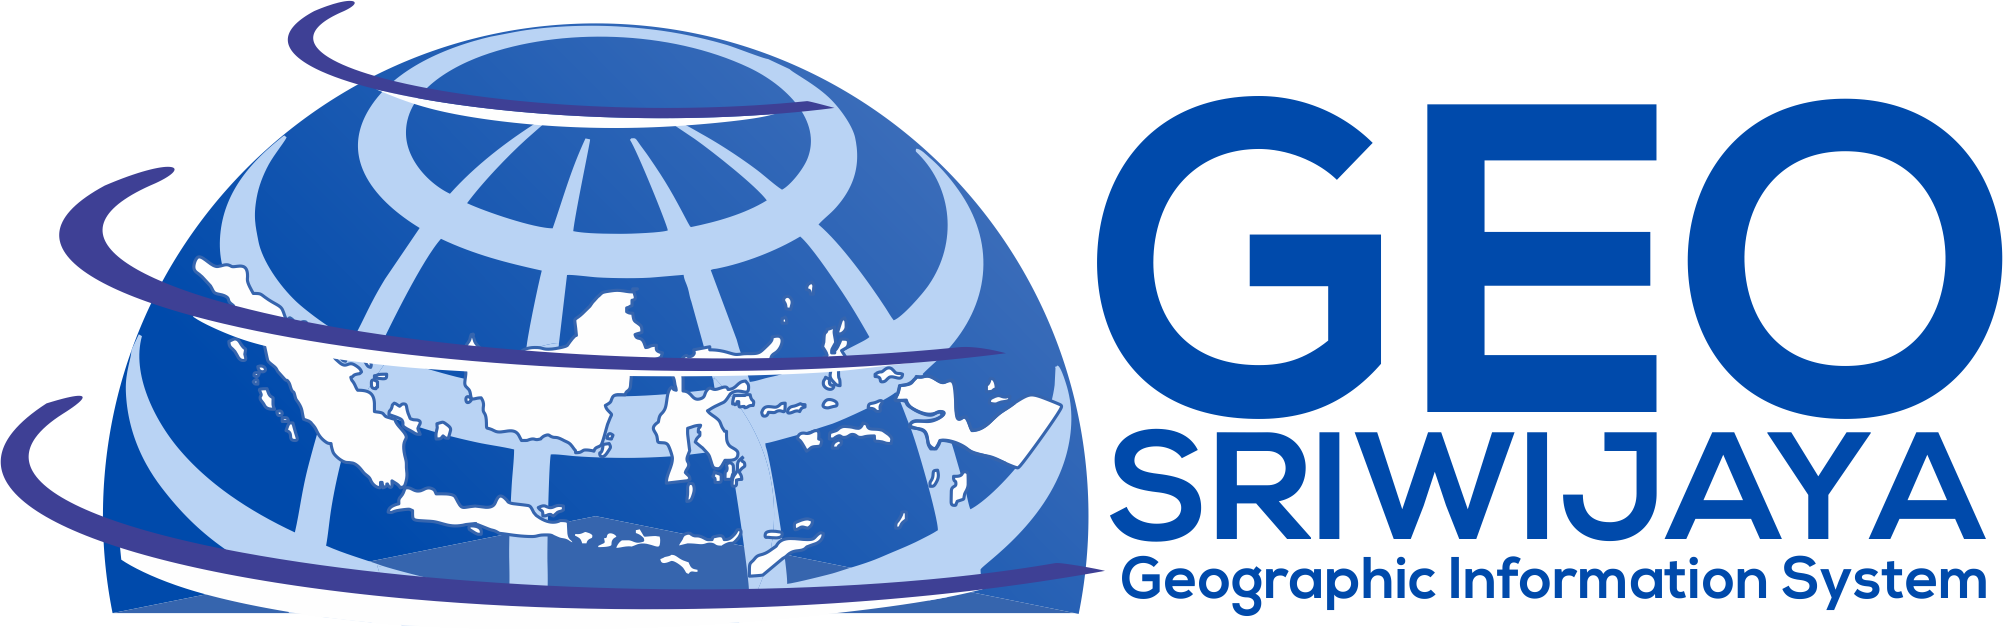 PT. Geosriwijaya Nusantara Group